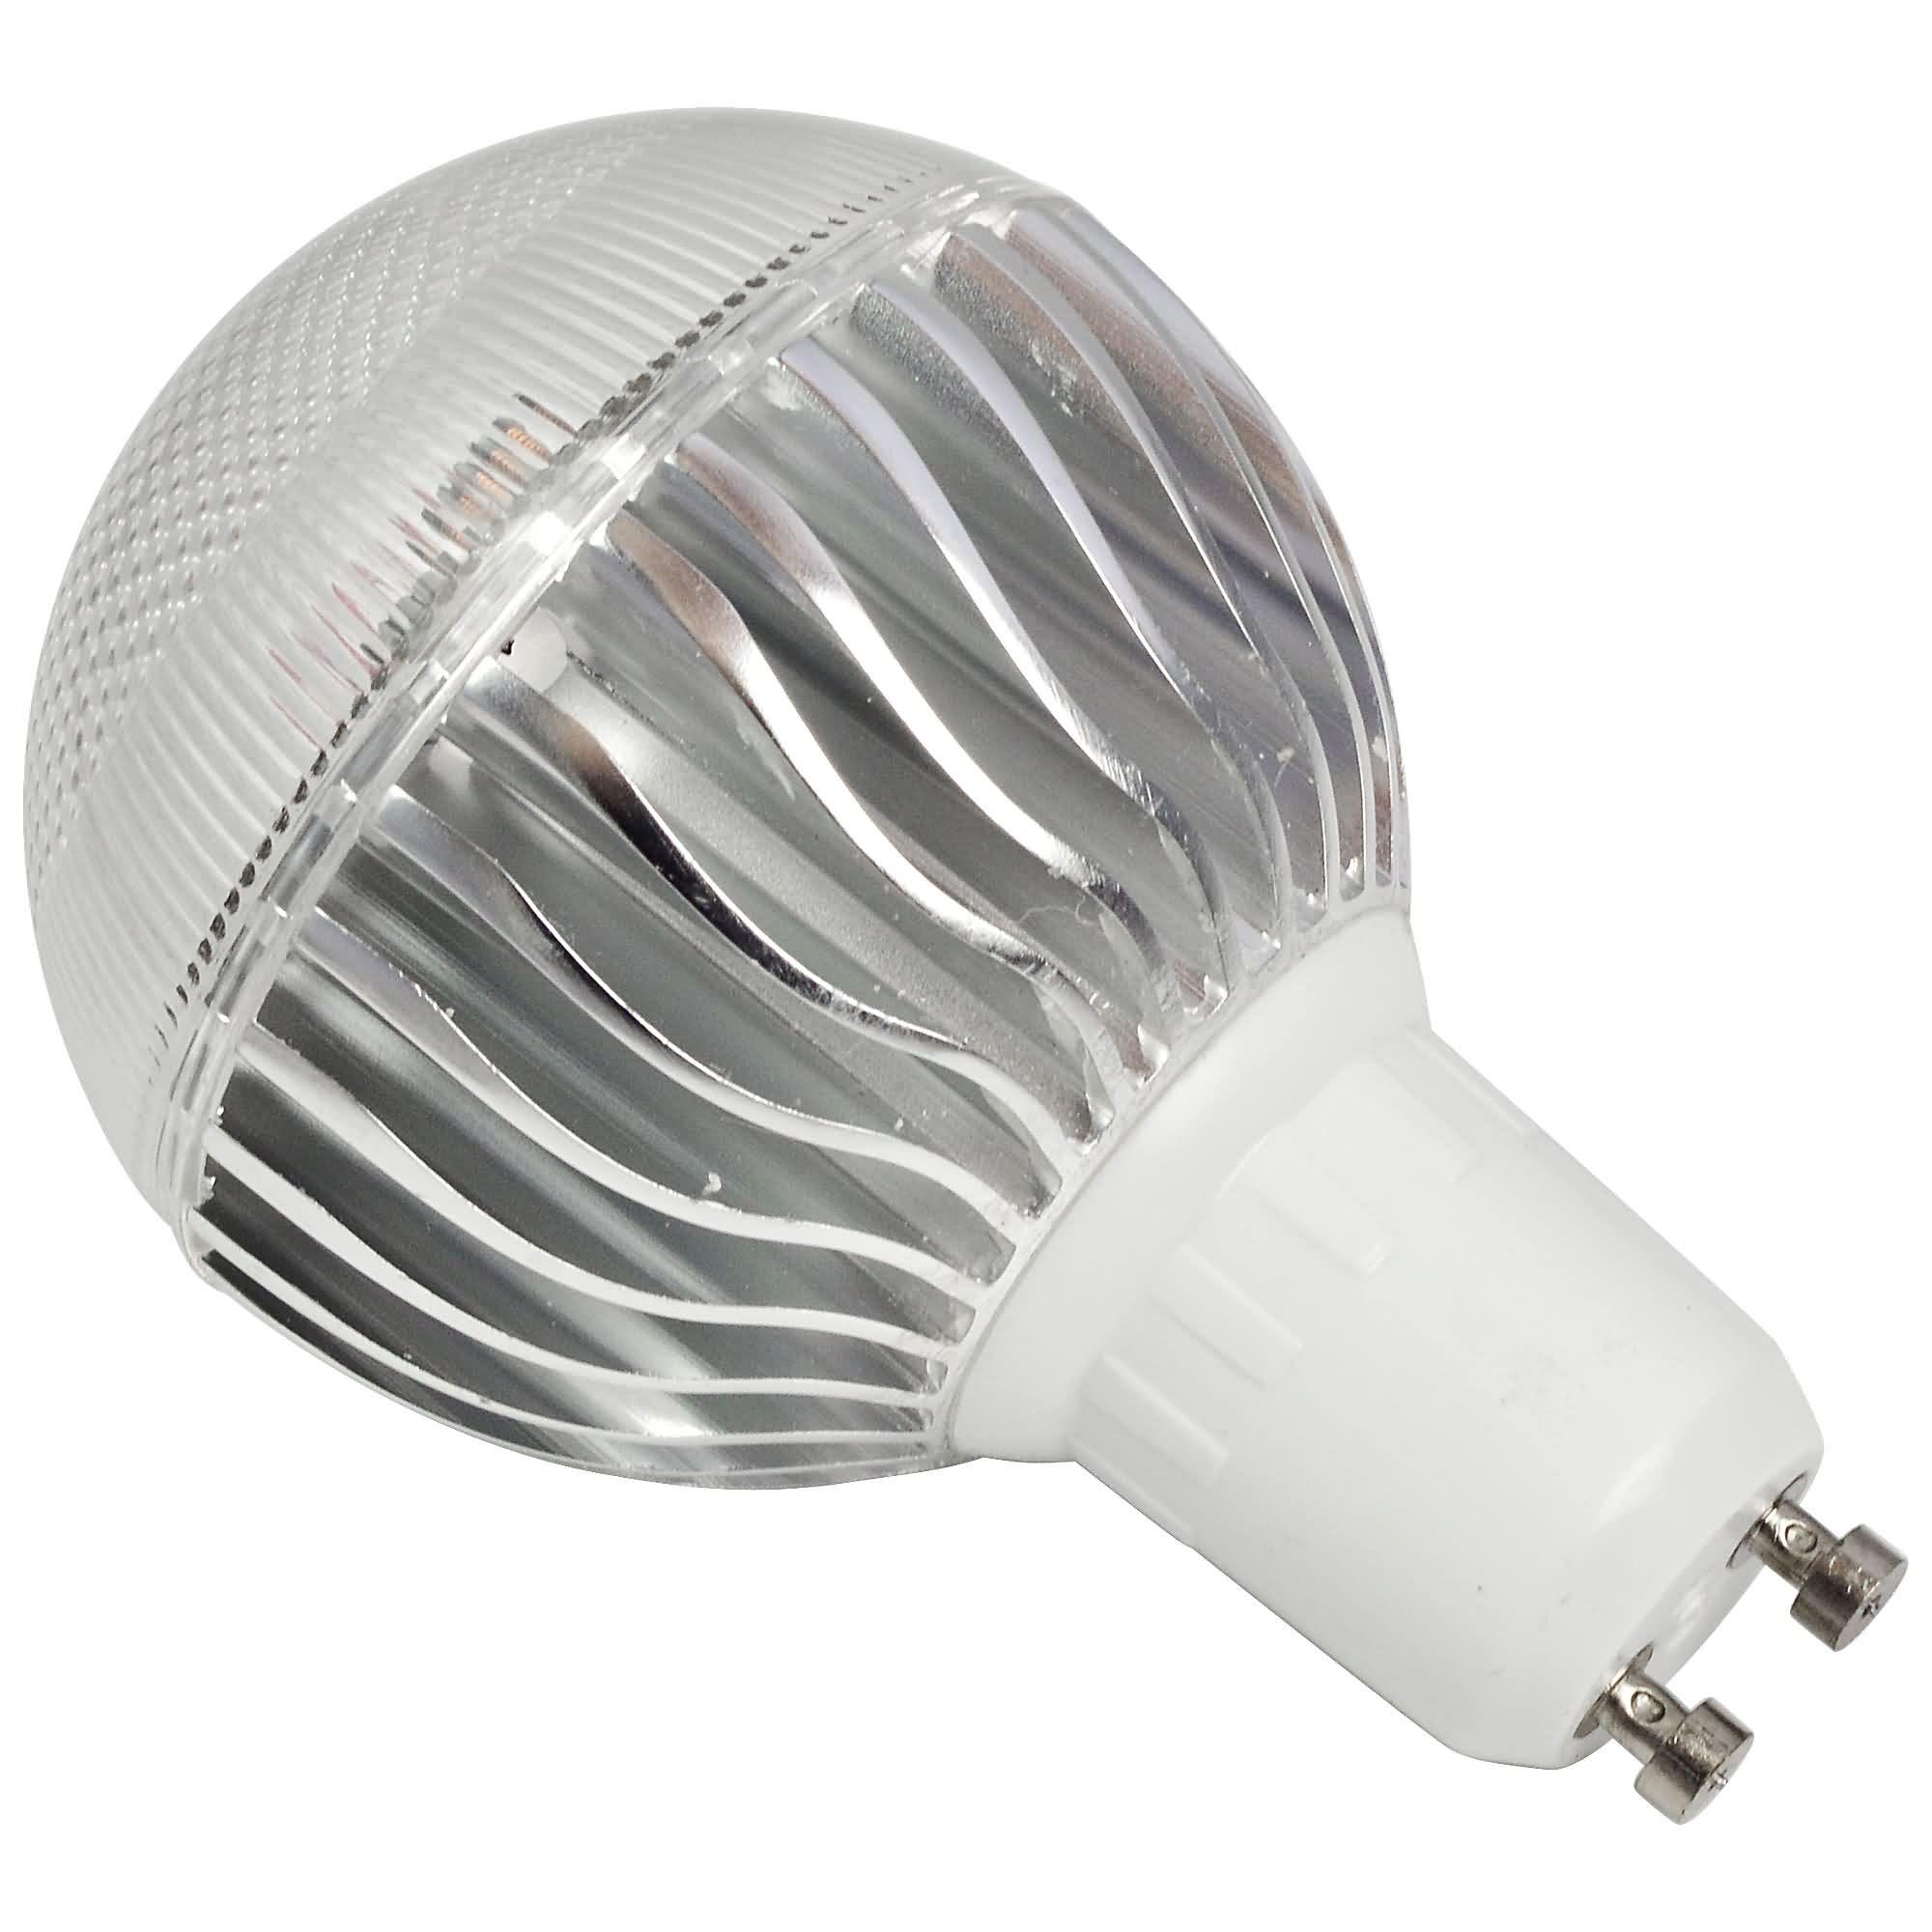 mengsled mengs 174 gu10 8w led rgb light 16 colour changing smd leds led globe l bulb with ir